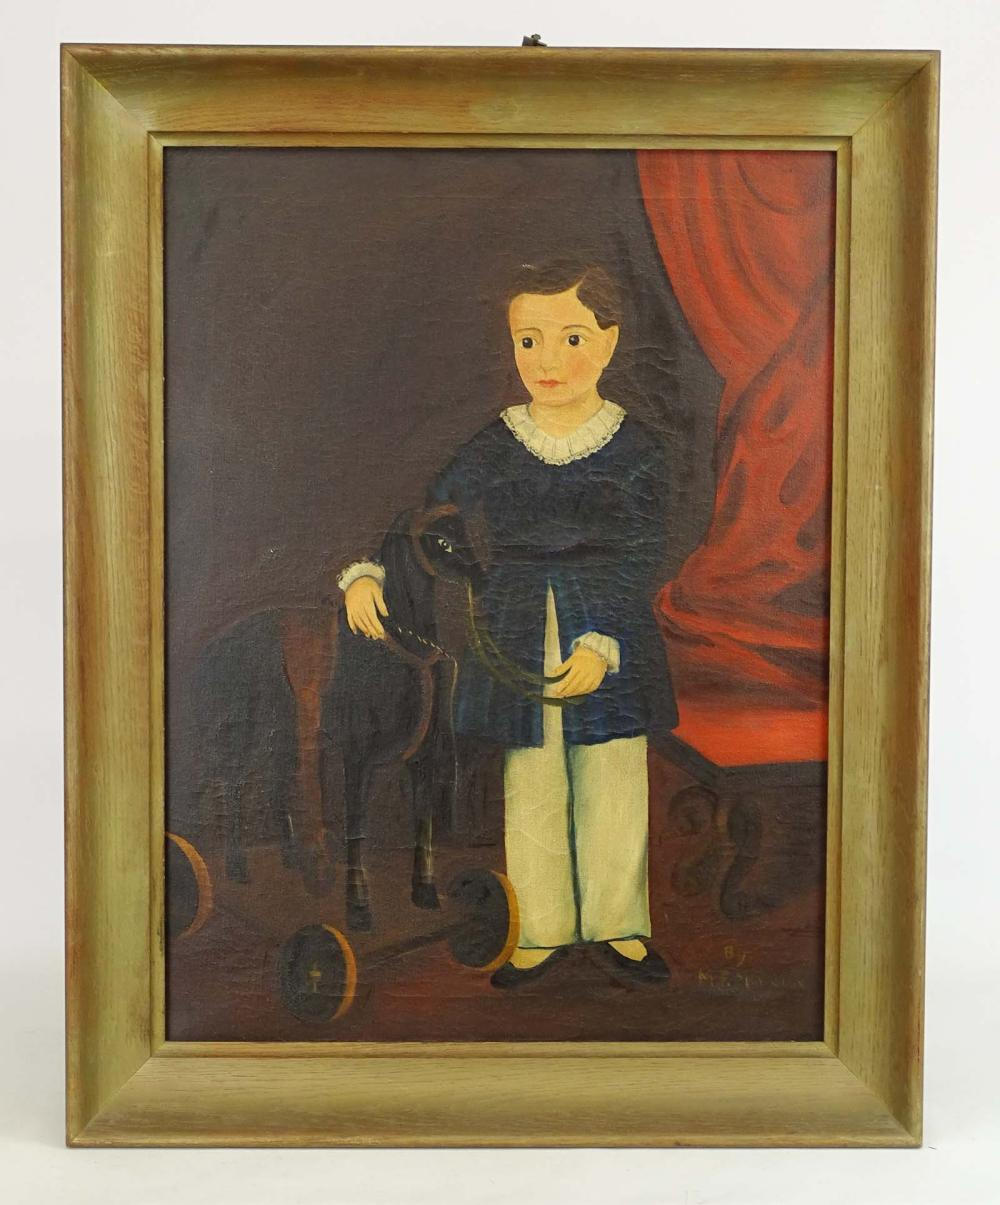 Lot 38: Folk Art Portrait Of Child With Rocking Horse